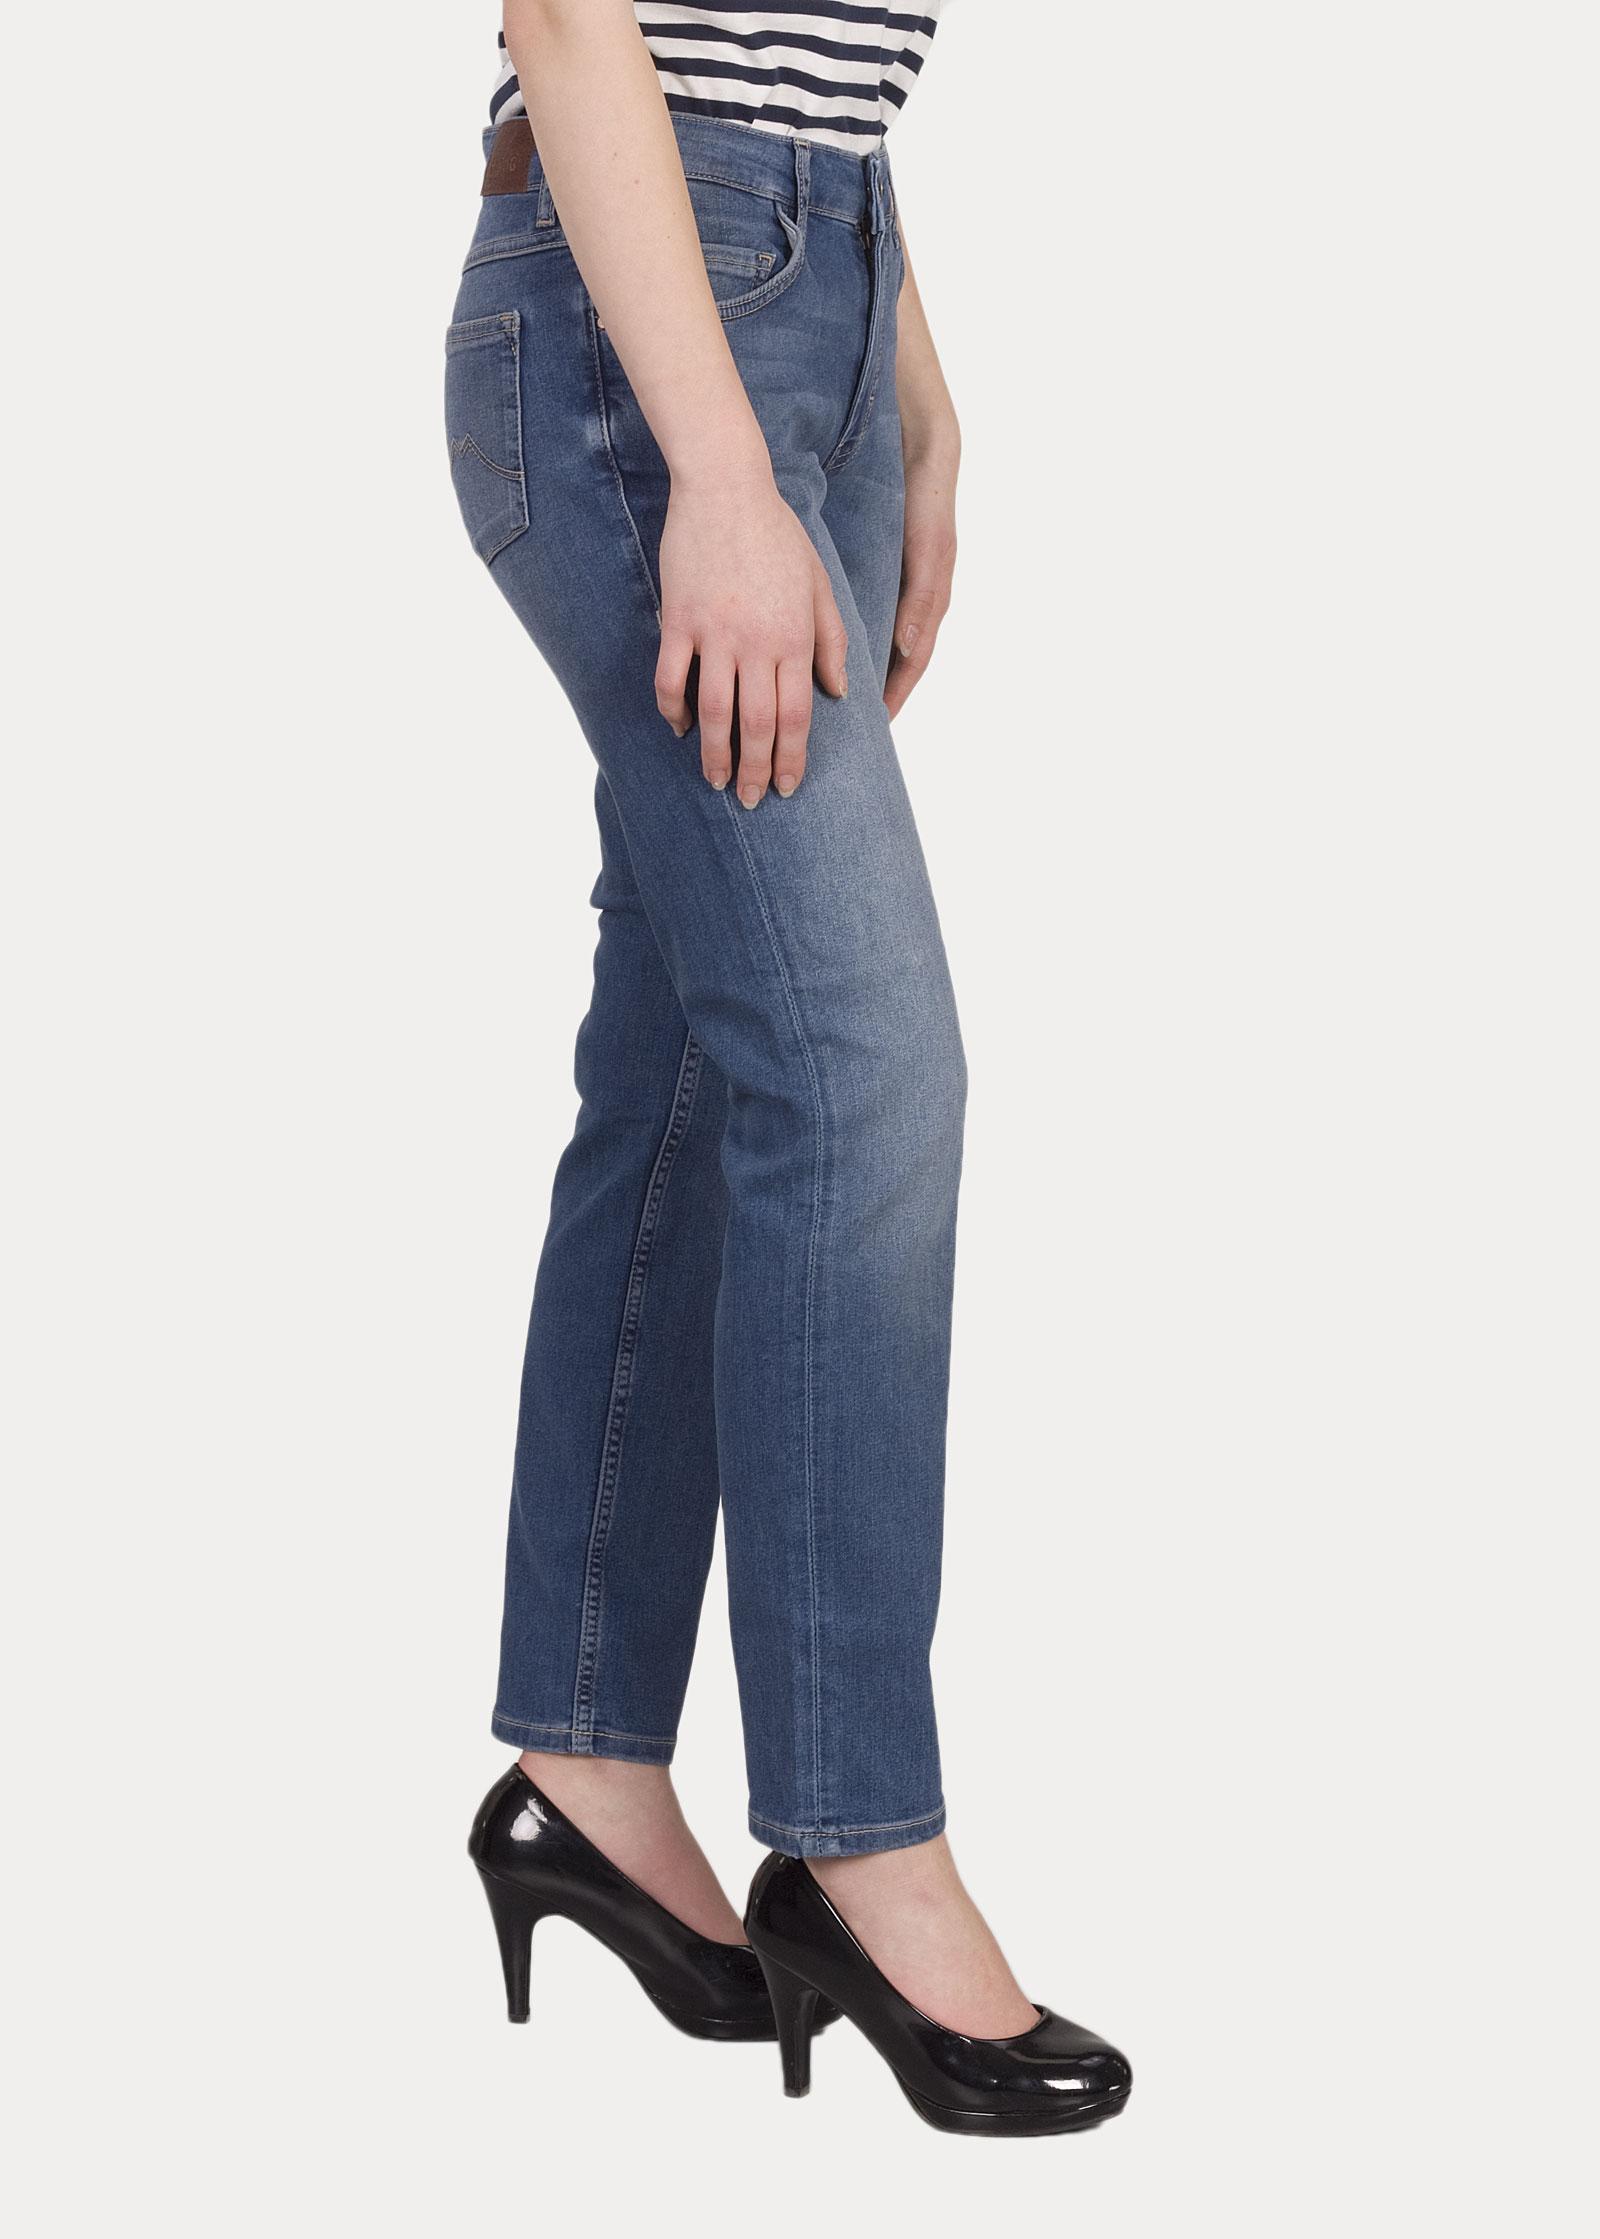 Damen Jeans Mustang Rebecca 312 Denim Blue